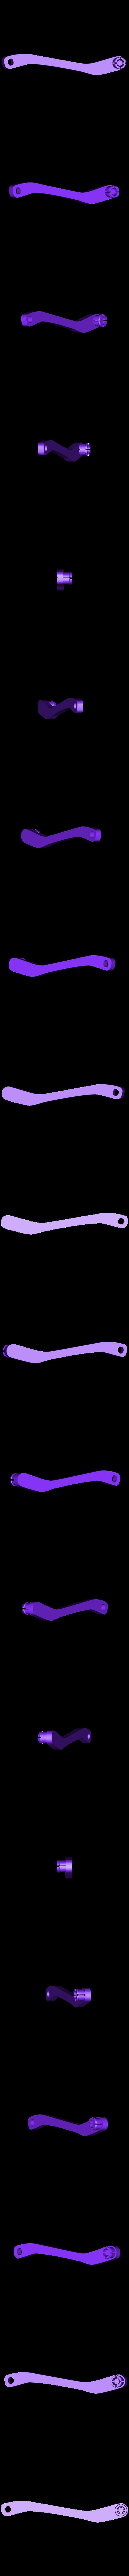 bar_outside4.stl Download free STL file Mechanical Prosthetic Concept Model • 3D printing design, boldmachines